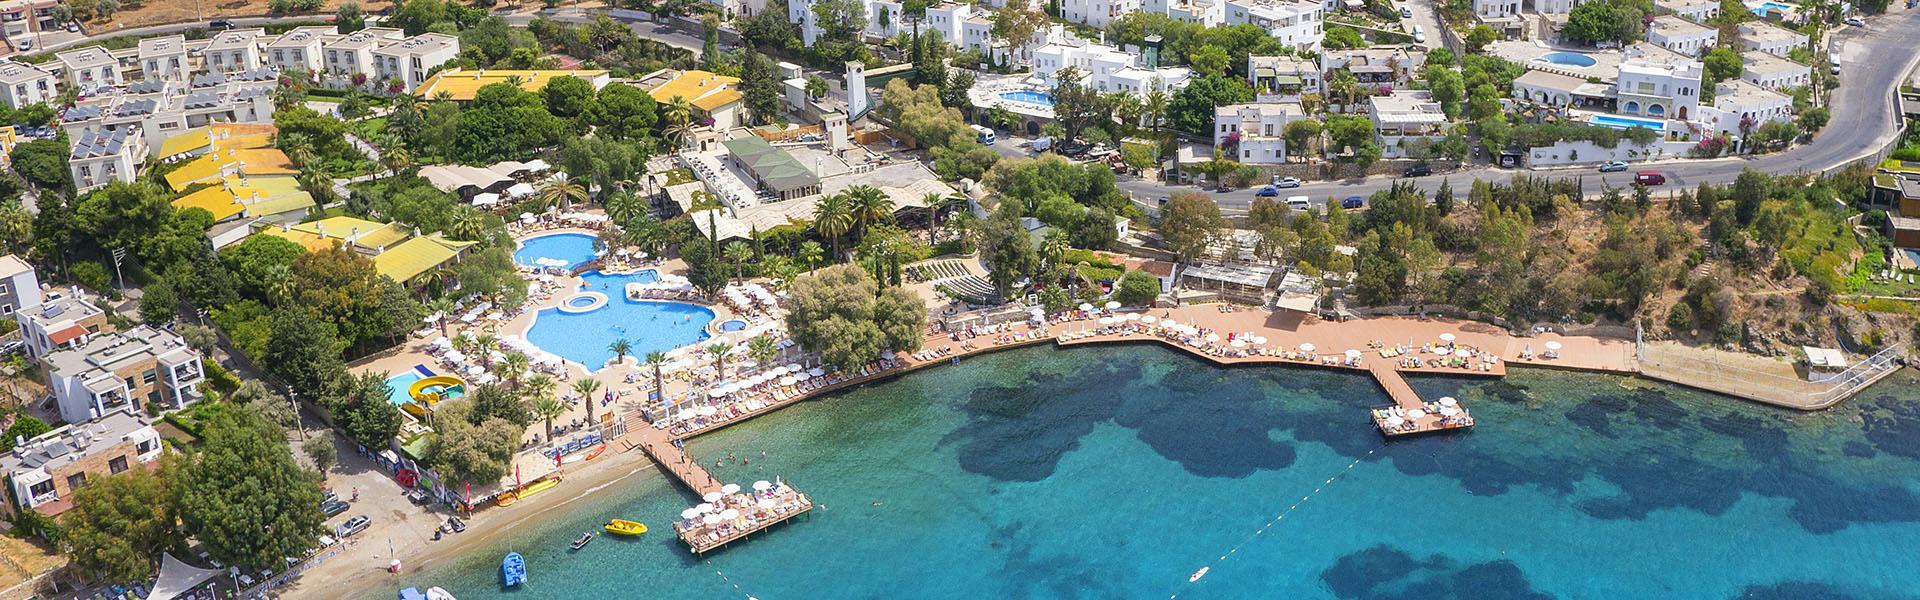 Vera Miramar Resort-Overview